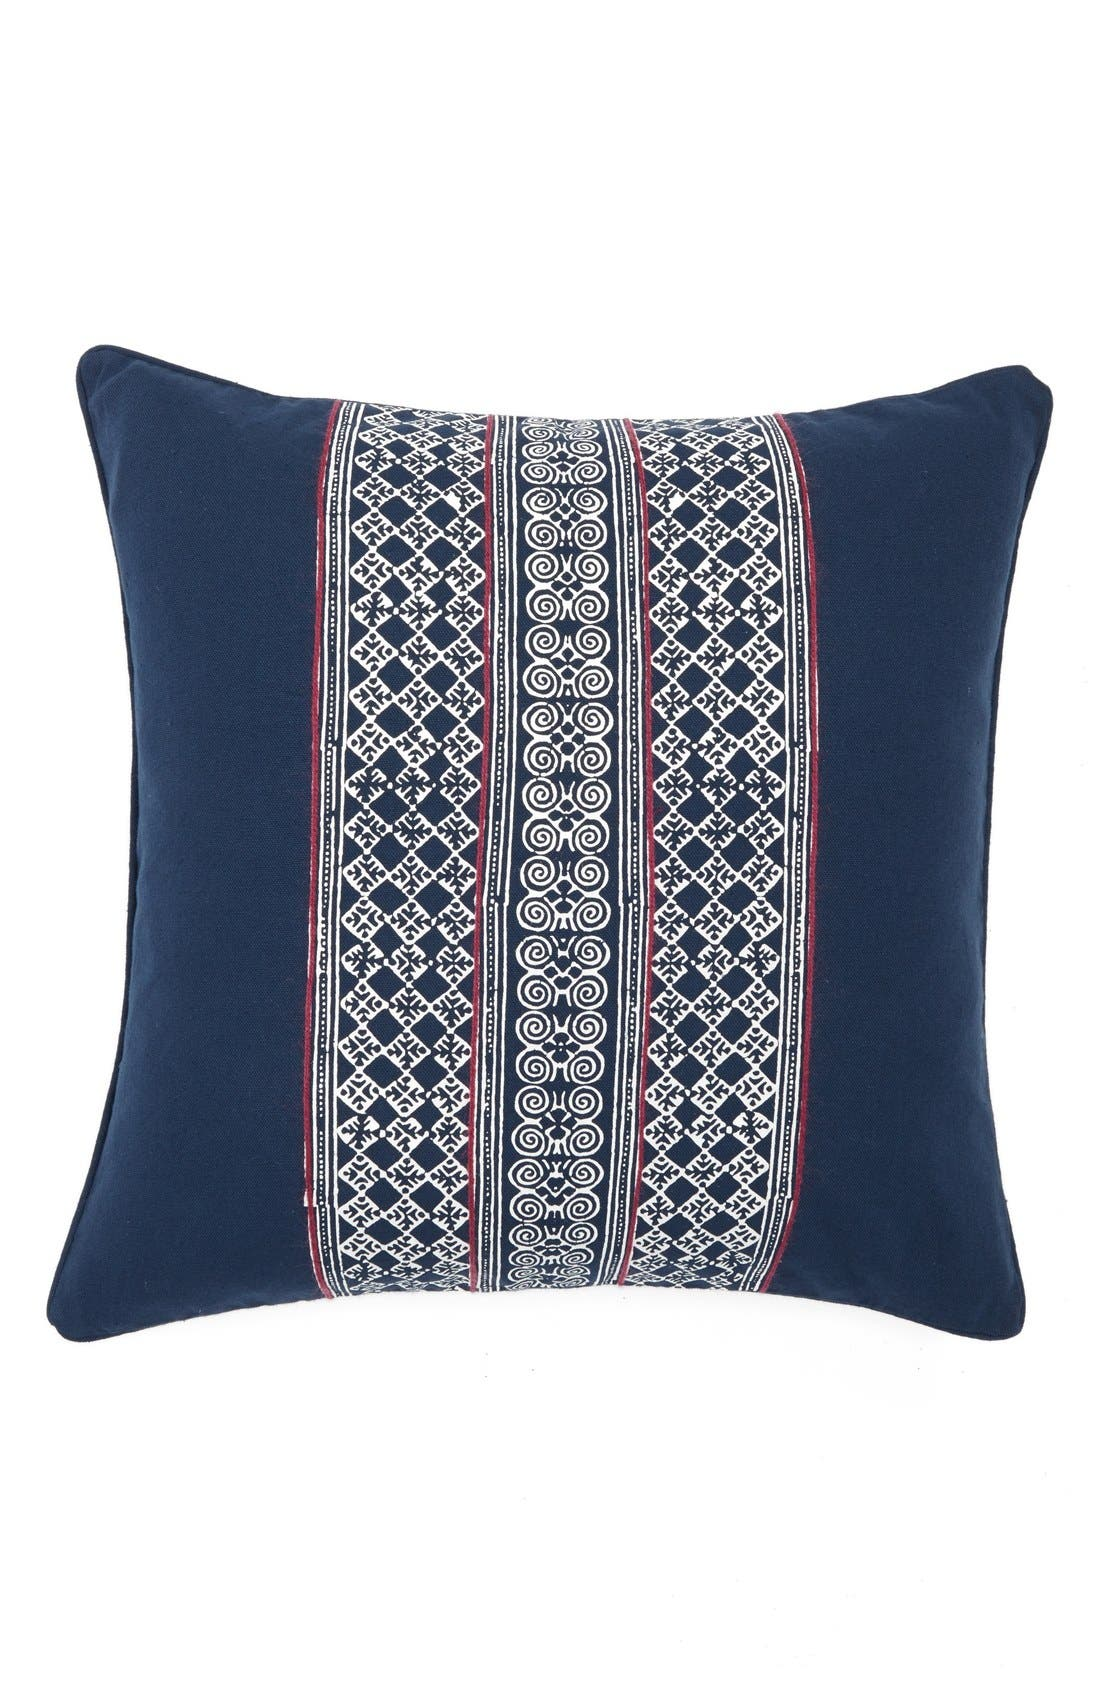 Alternate Image 1 Selected - Levtex 'Cordelia' Screenprint Pillow